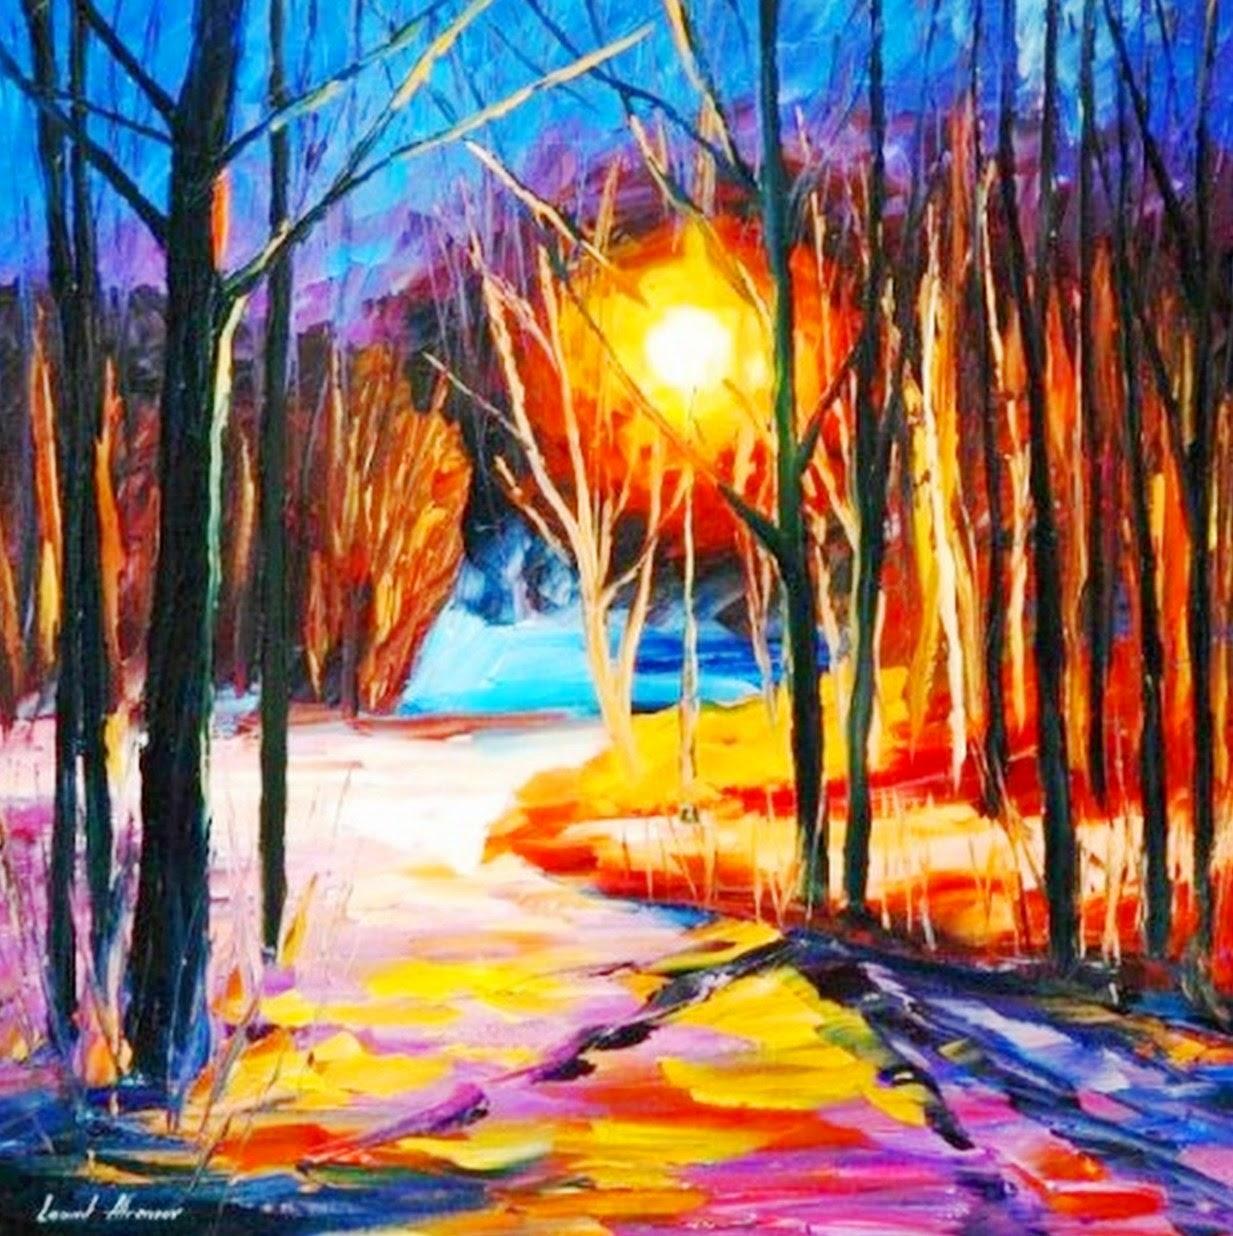 imagenes-de-pinturas-espatula-paisajes